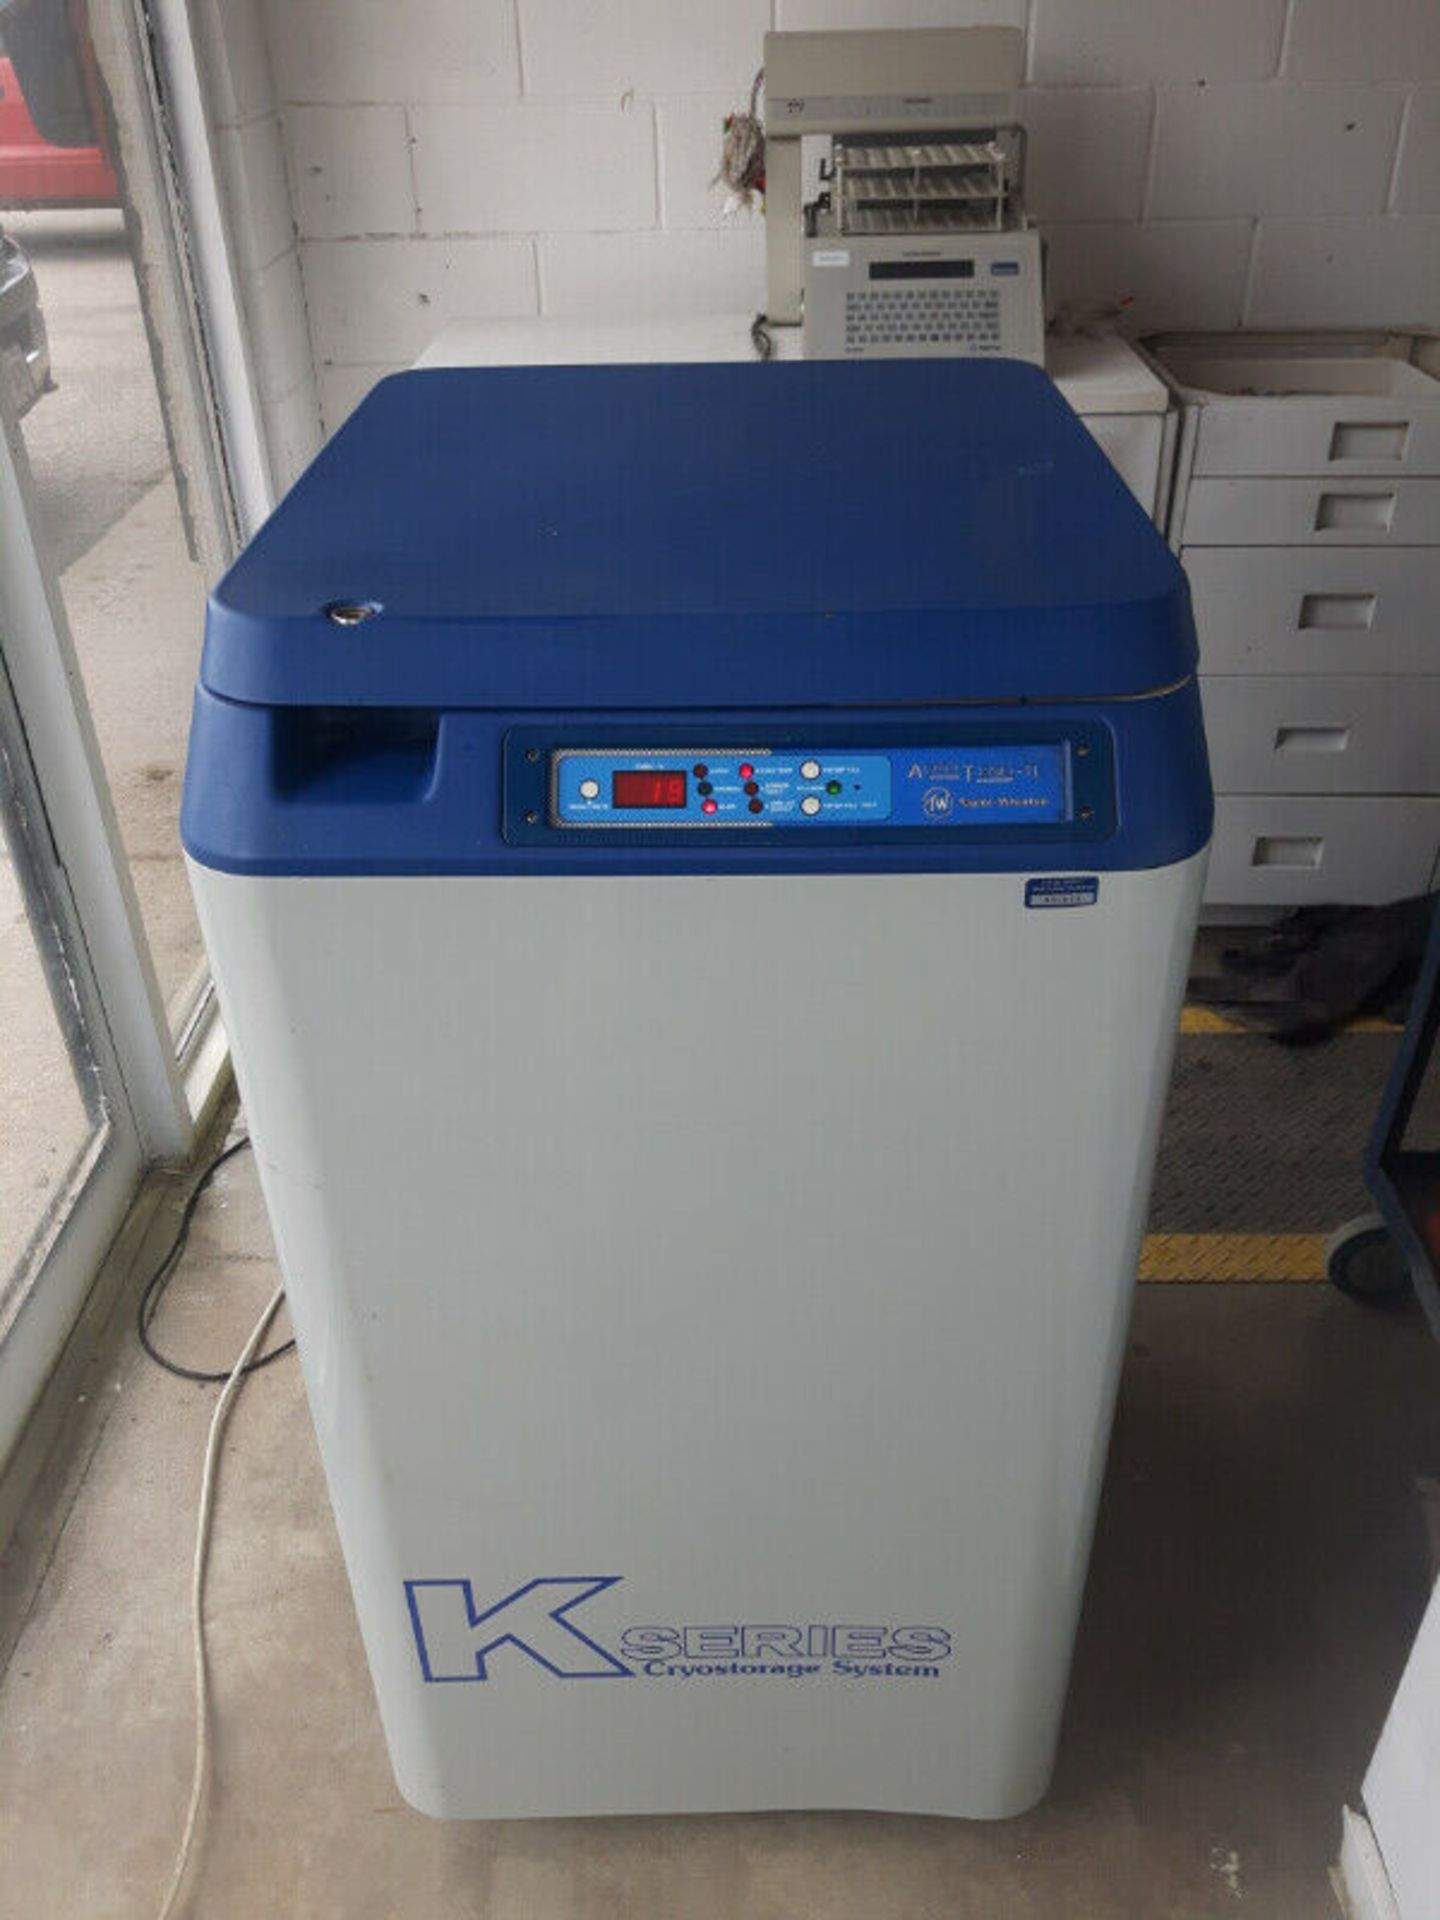 Taylor Wharton Kryos 10k Liquid Notrogen Cryogenic Storage Reserves - LOCATION - LONDON, ONTARIO